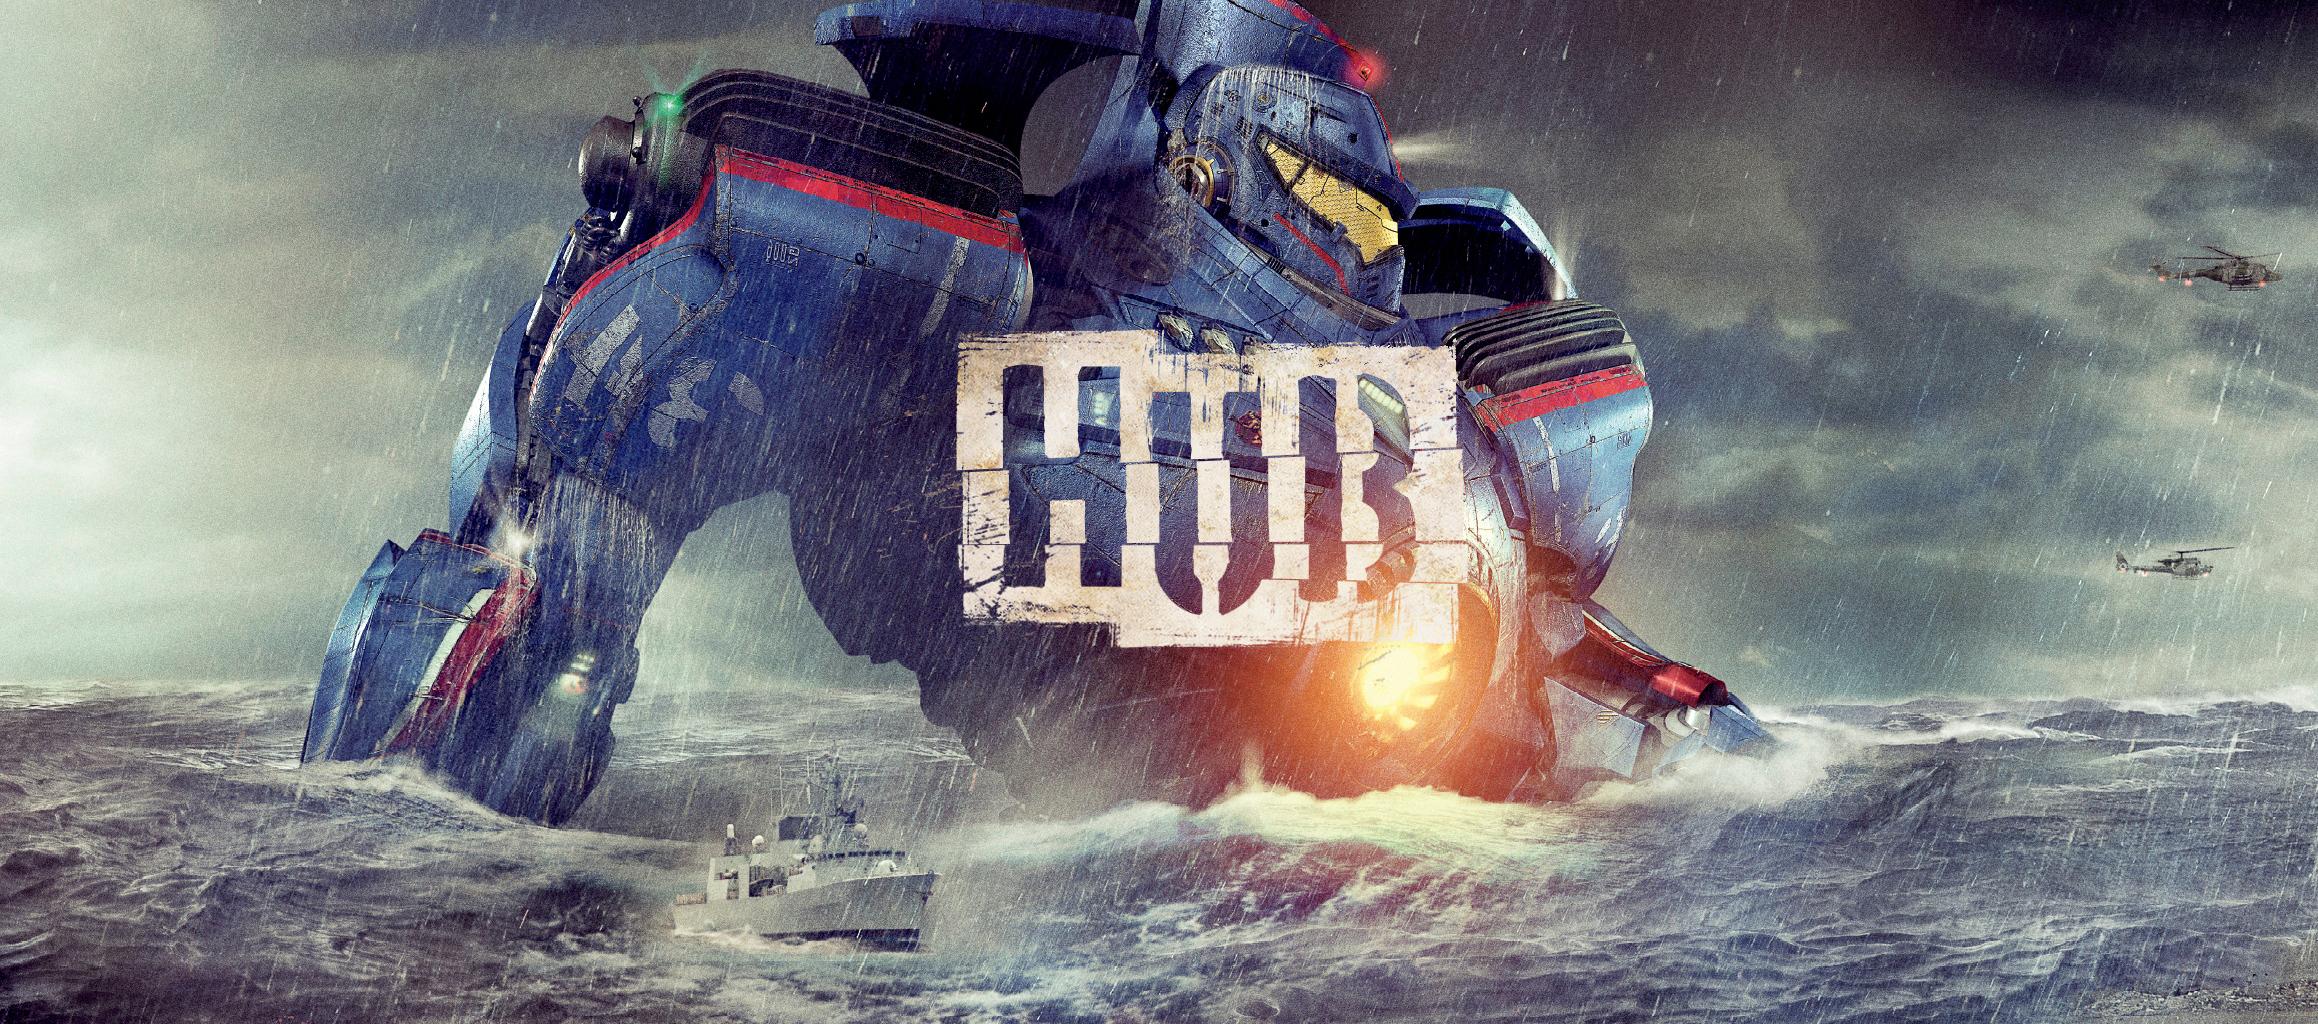 Pacific Rim - Hub #1 Banner